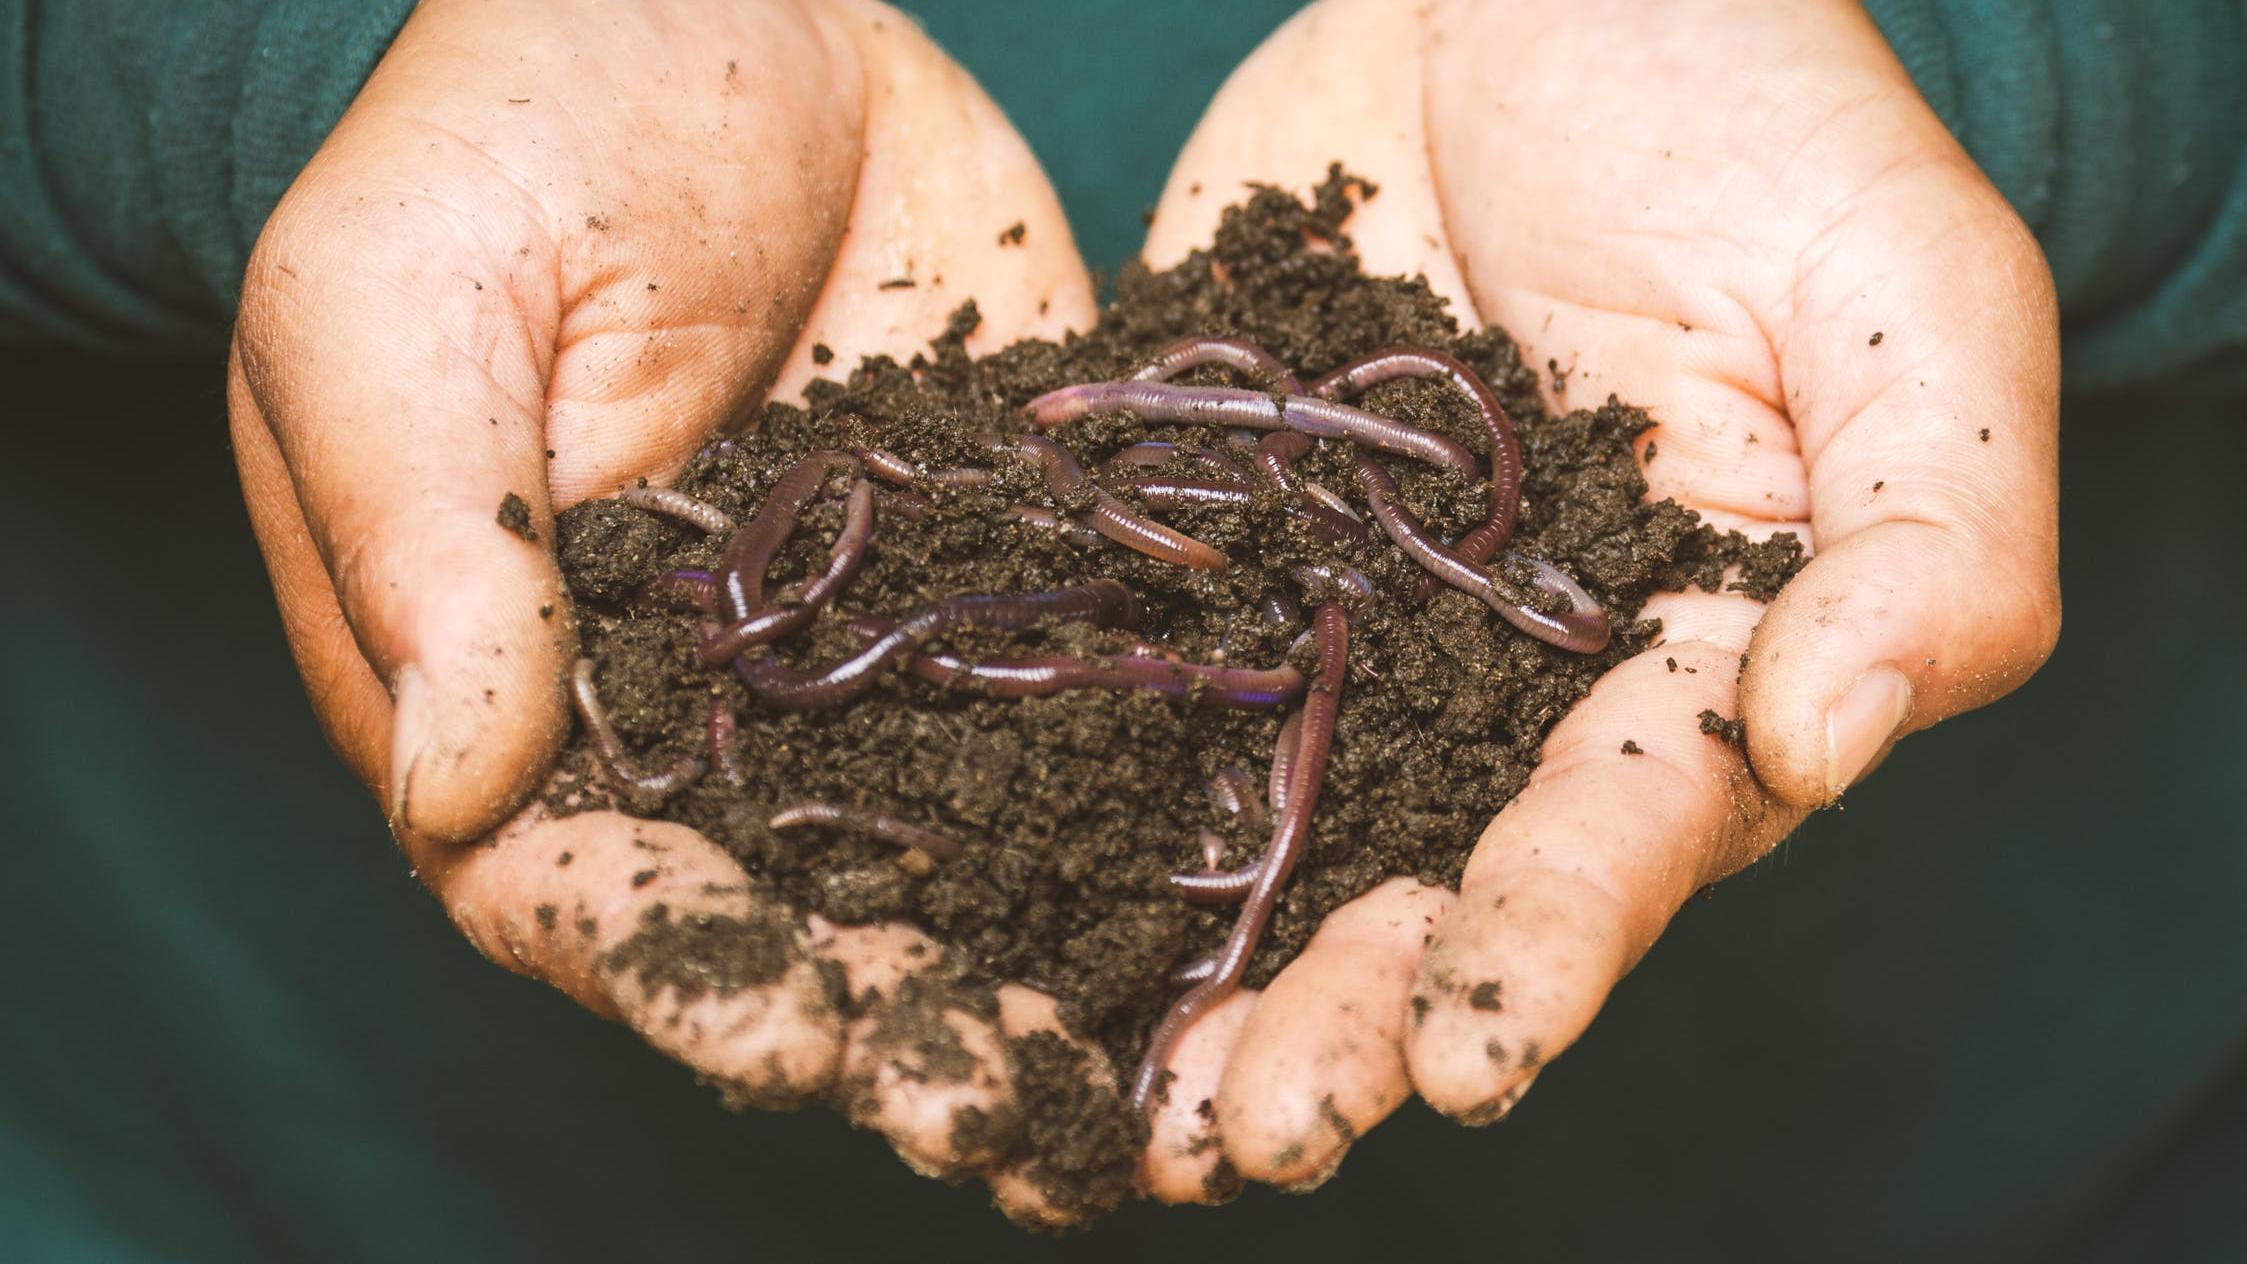 Bodenanalyse selber machen - so geht's